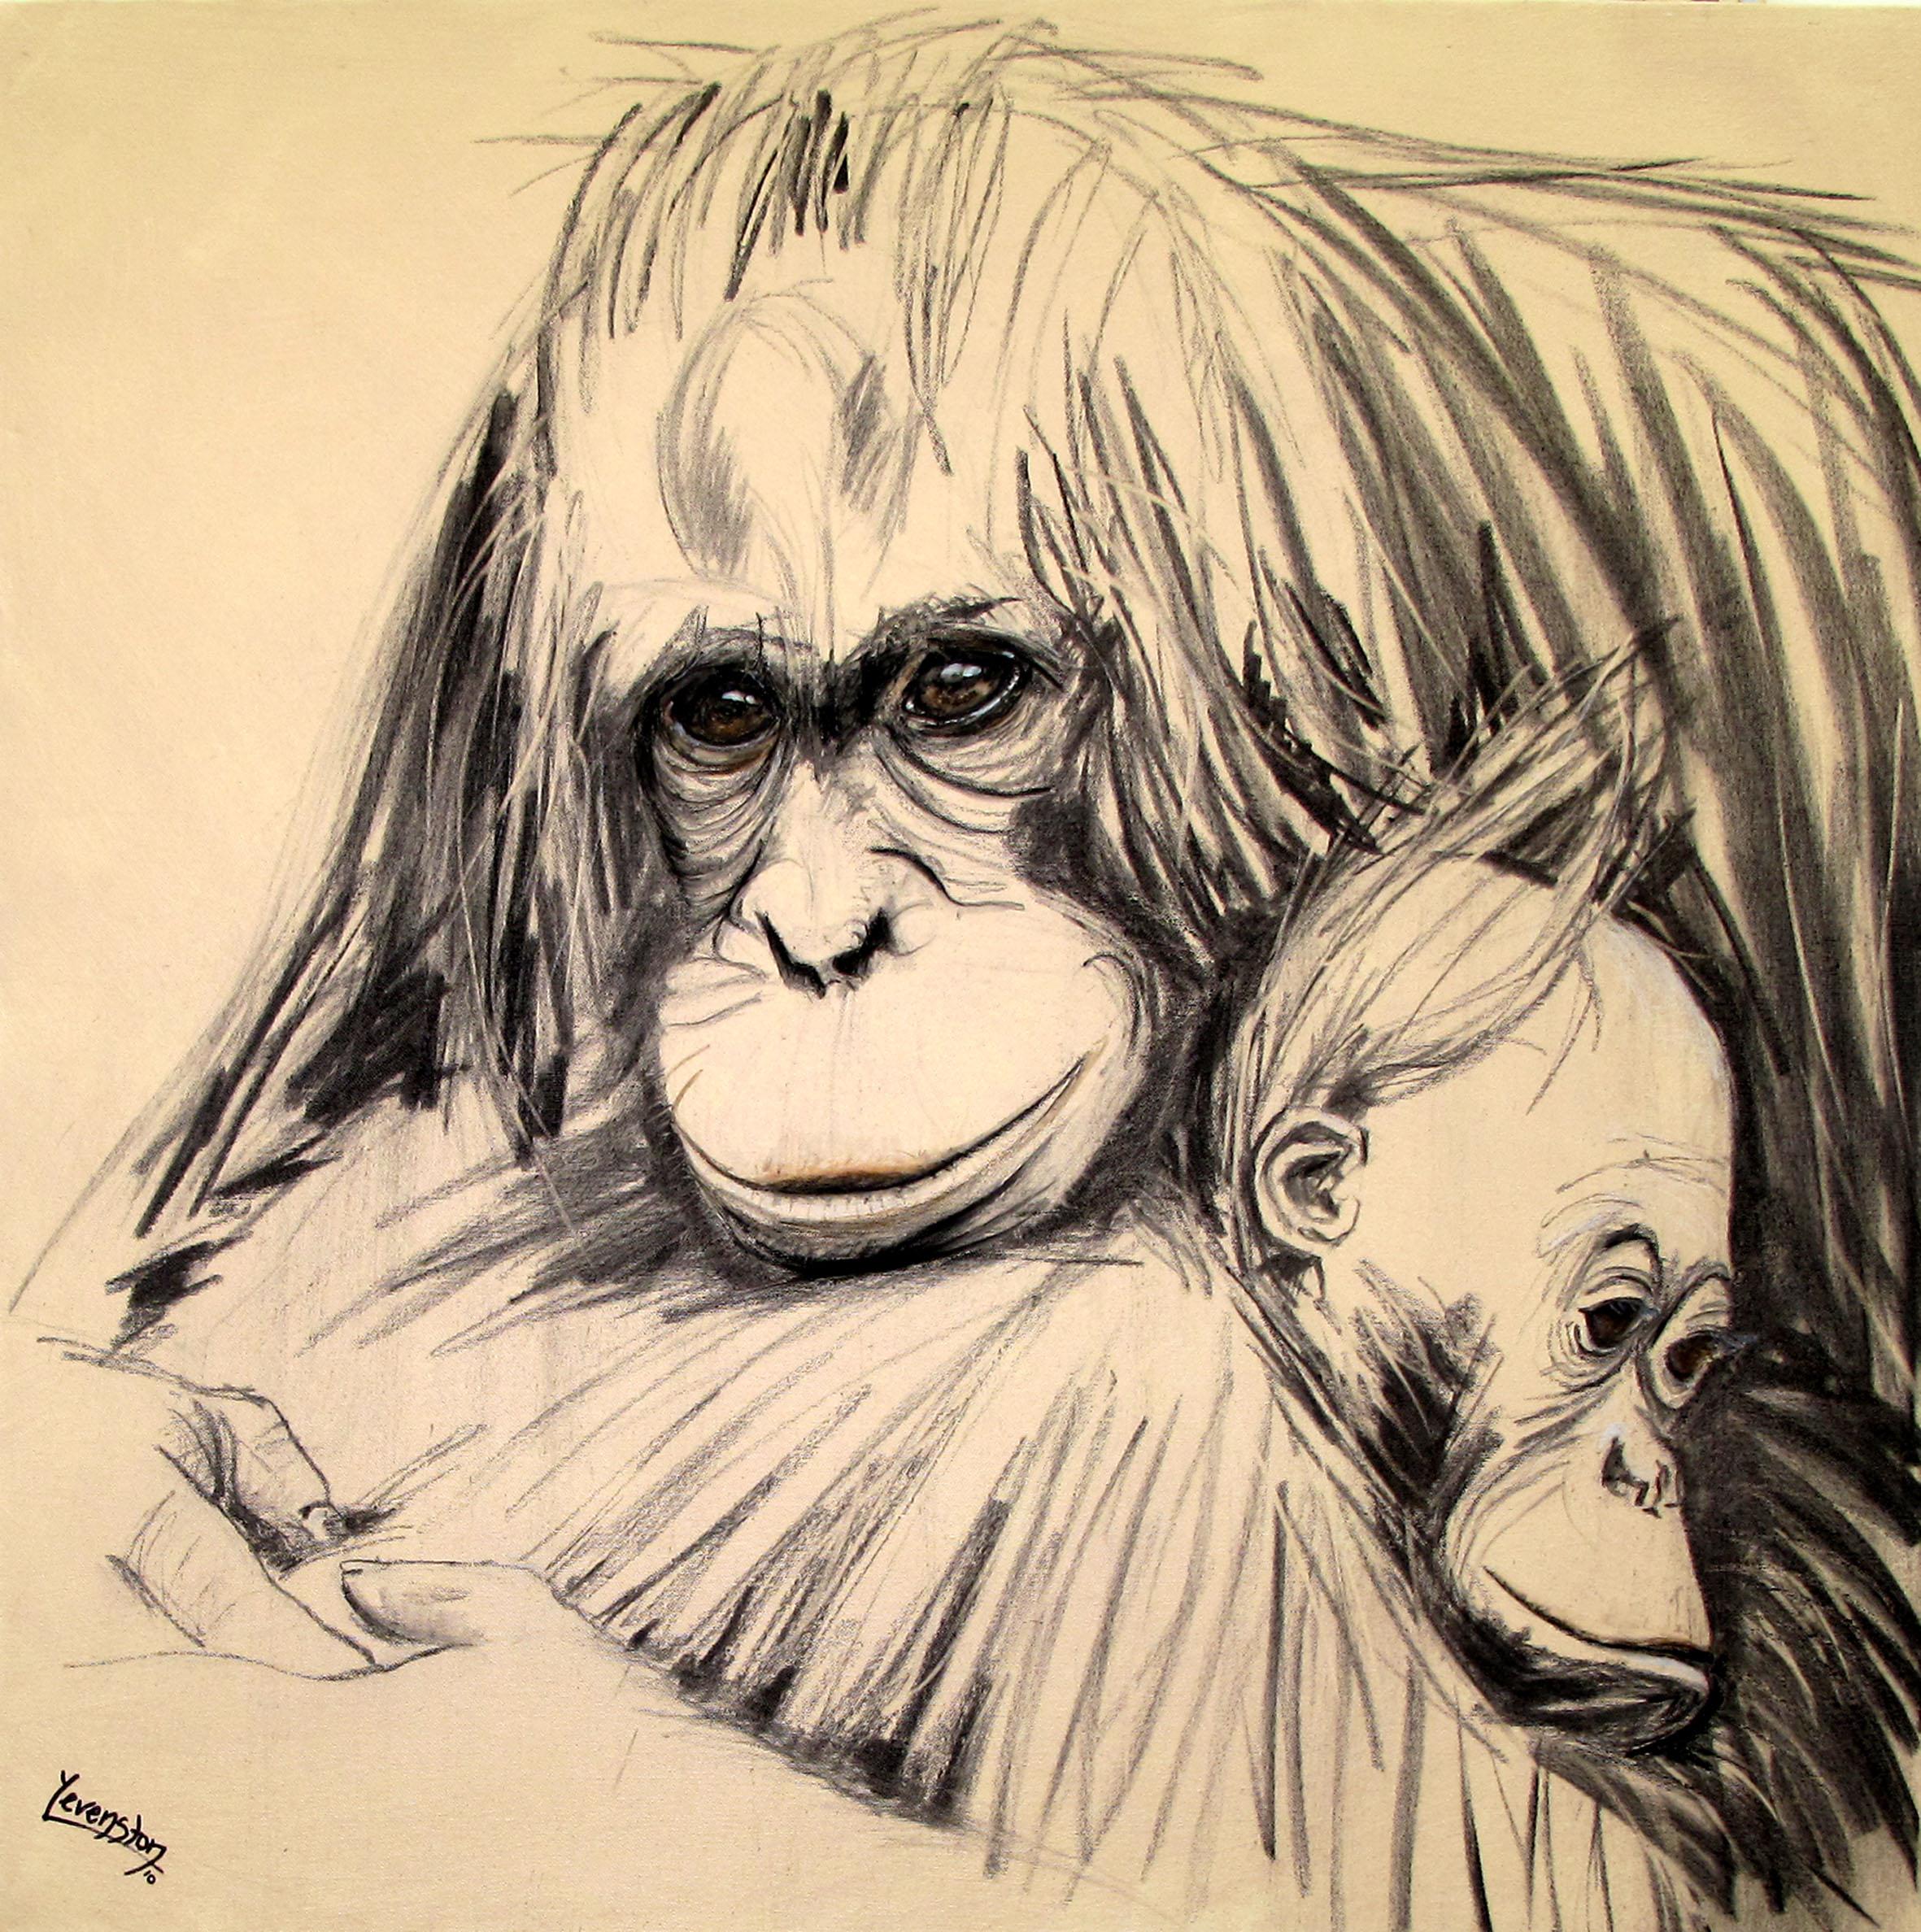 Orangutan_Cuddles_1mg.jpg